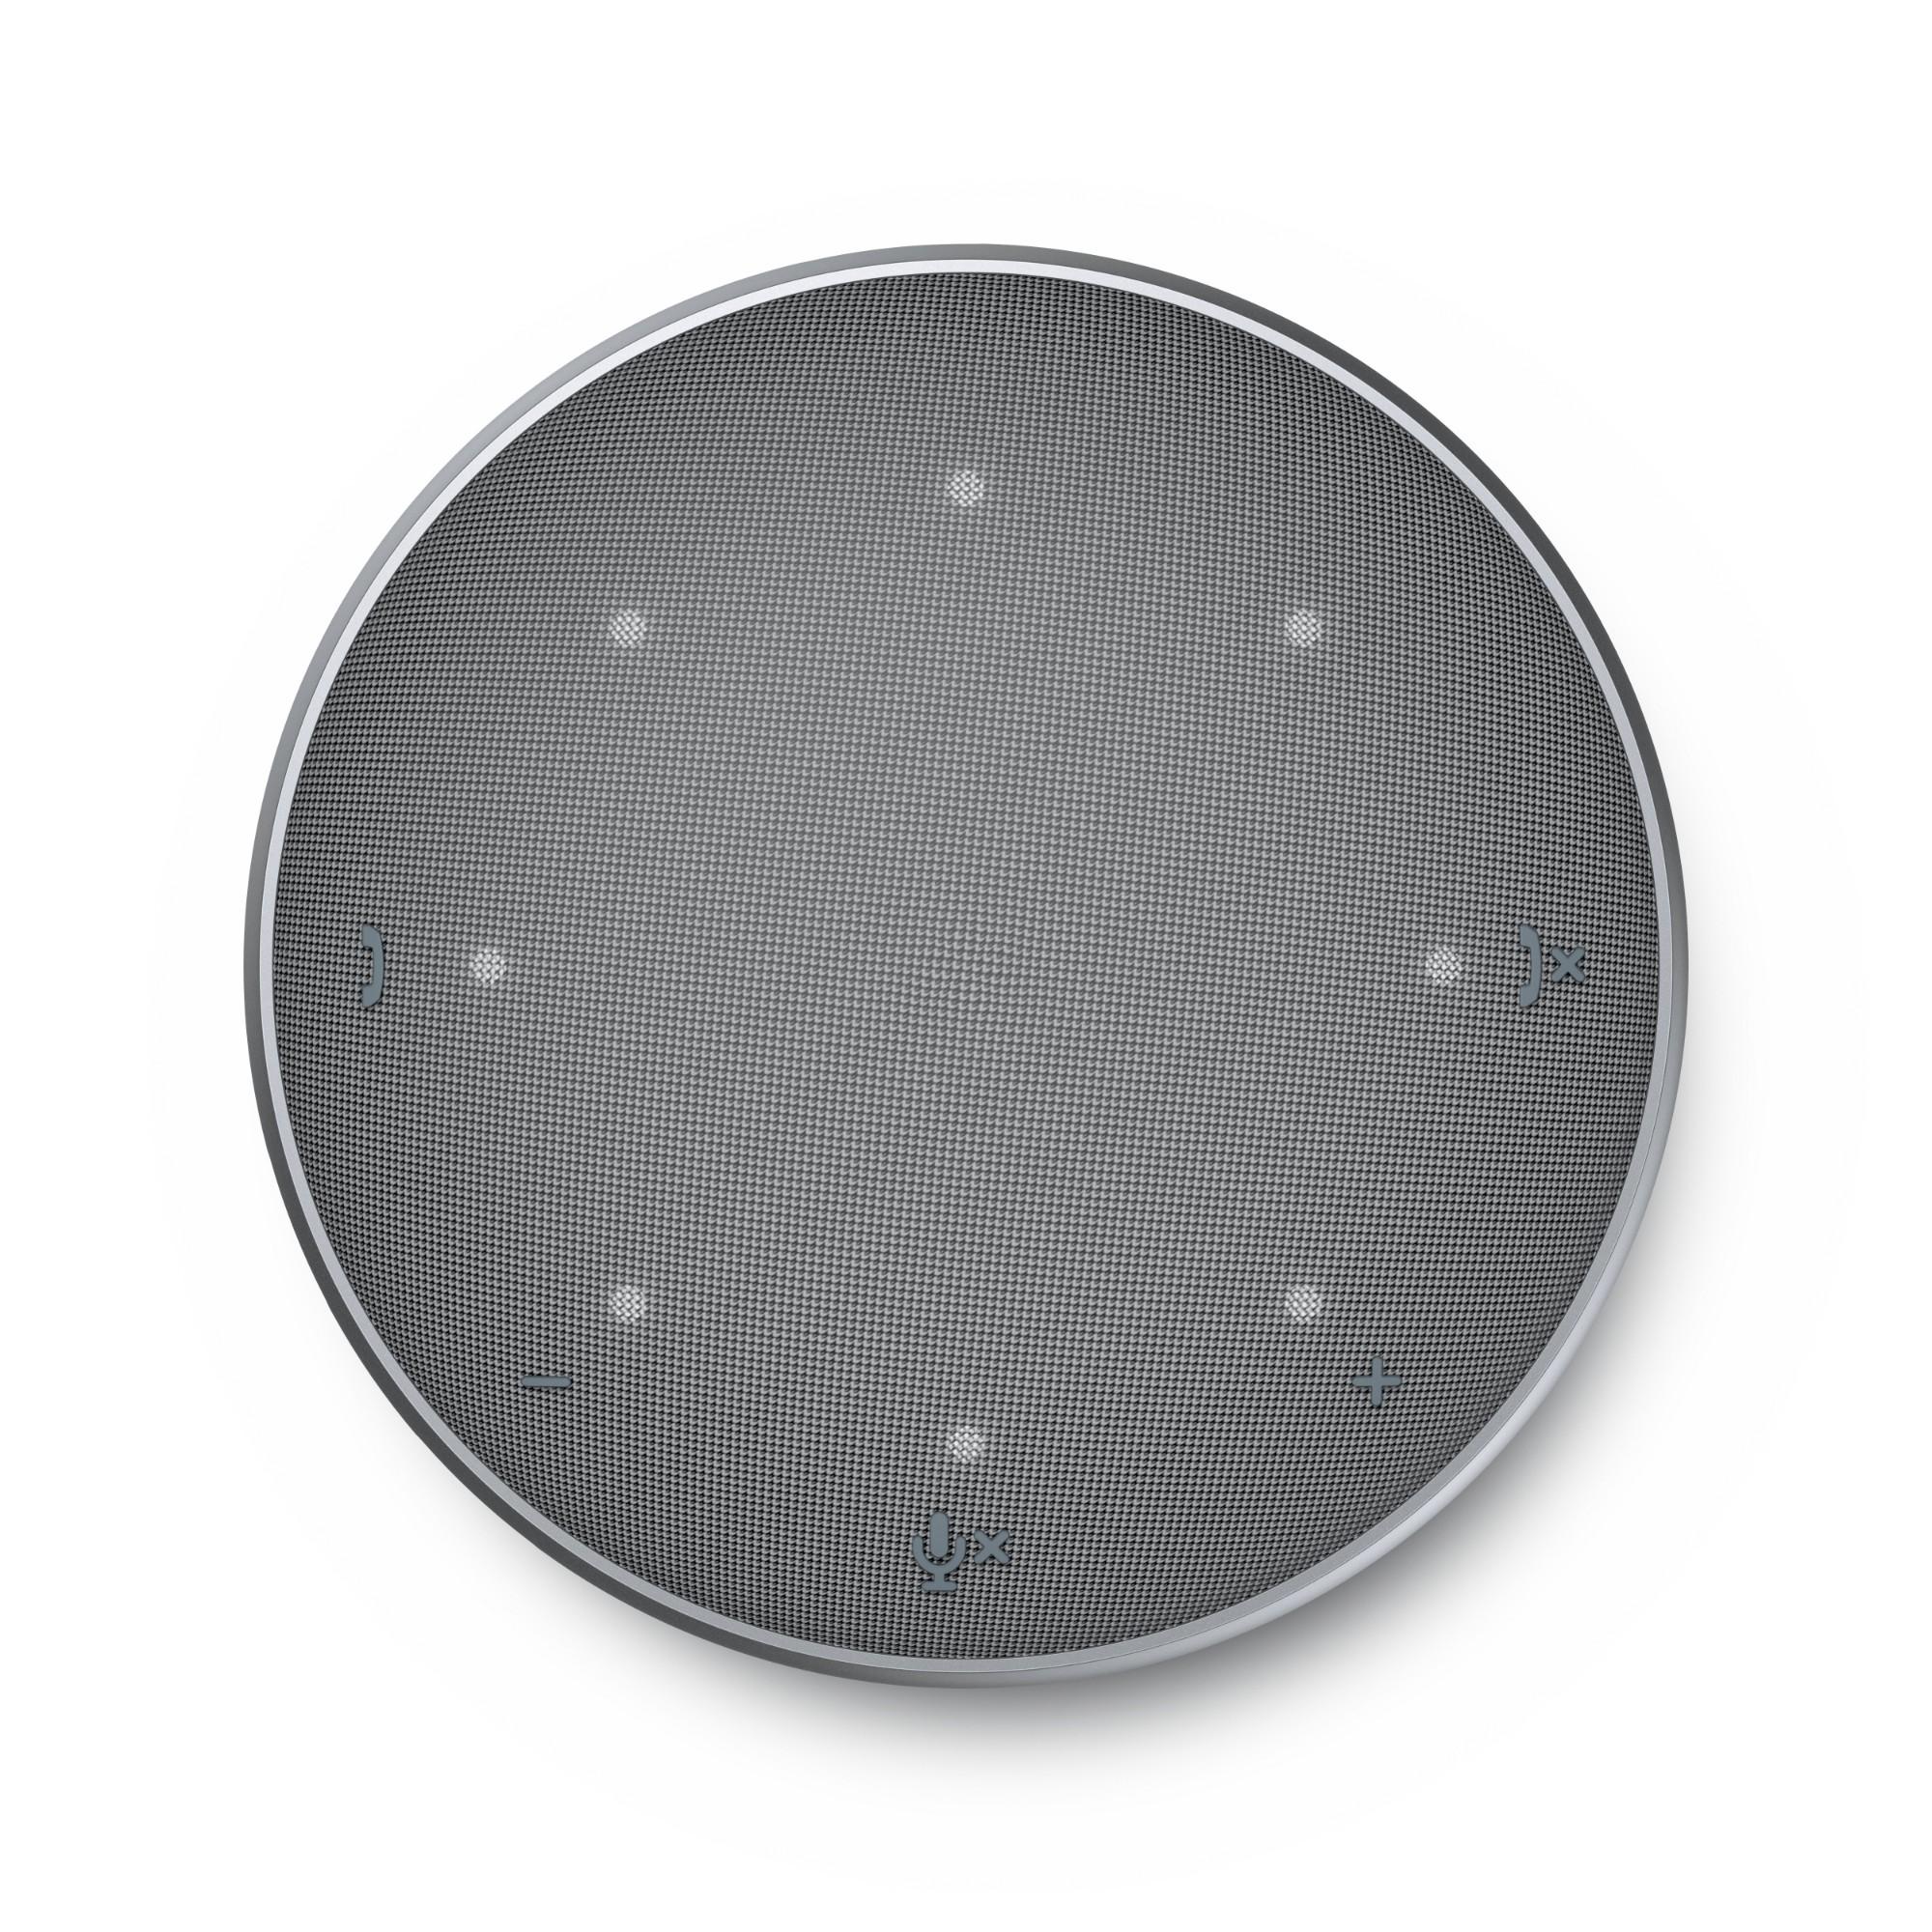 DELL Mobile Adapter Speakerphone- MH3021P